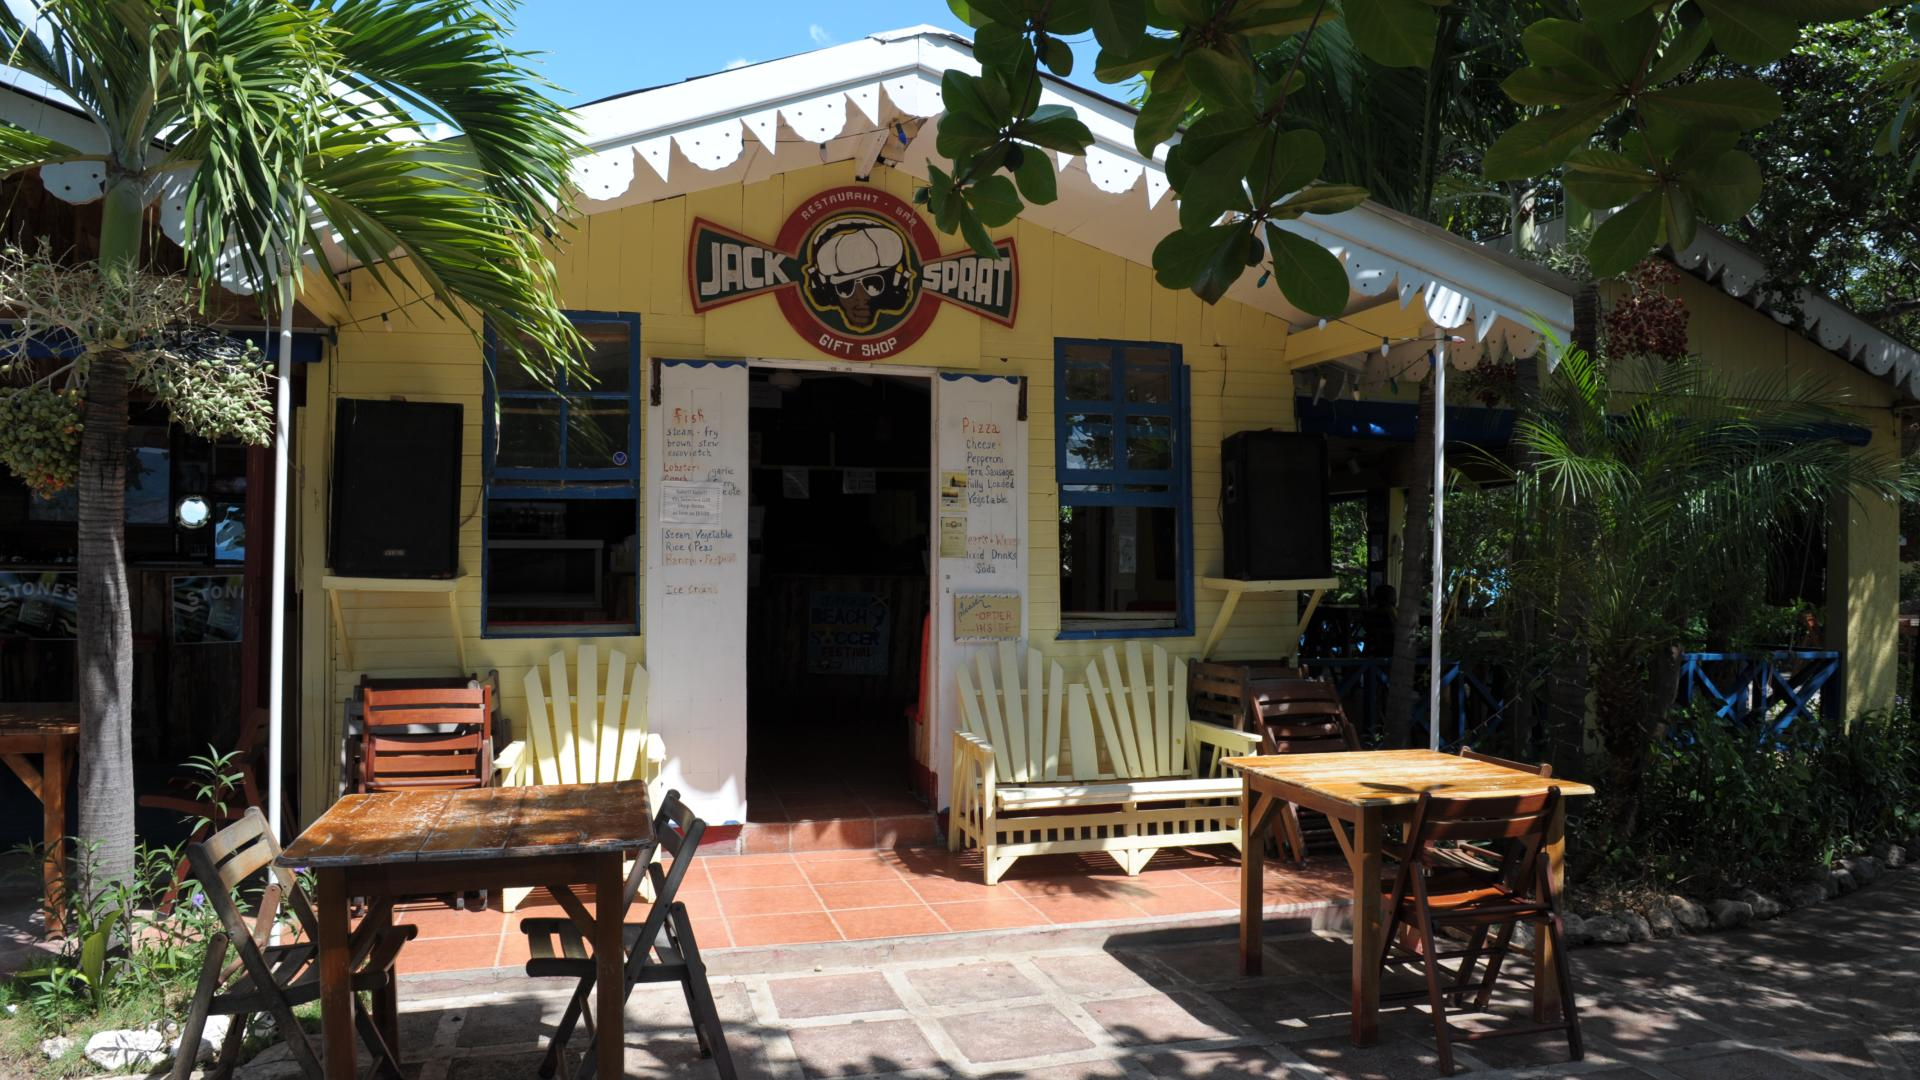 Jack Sprat Restaurant